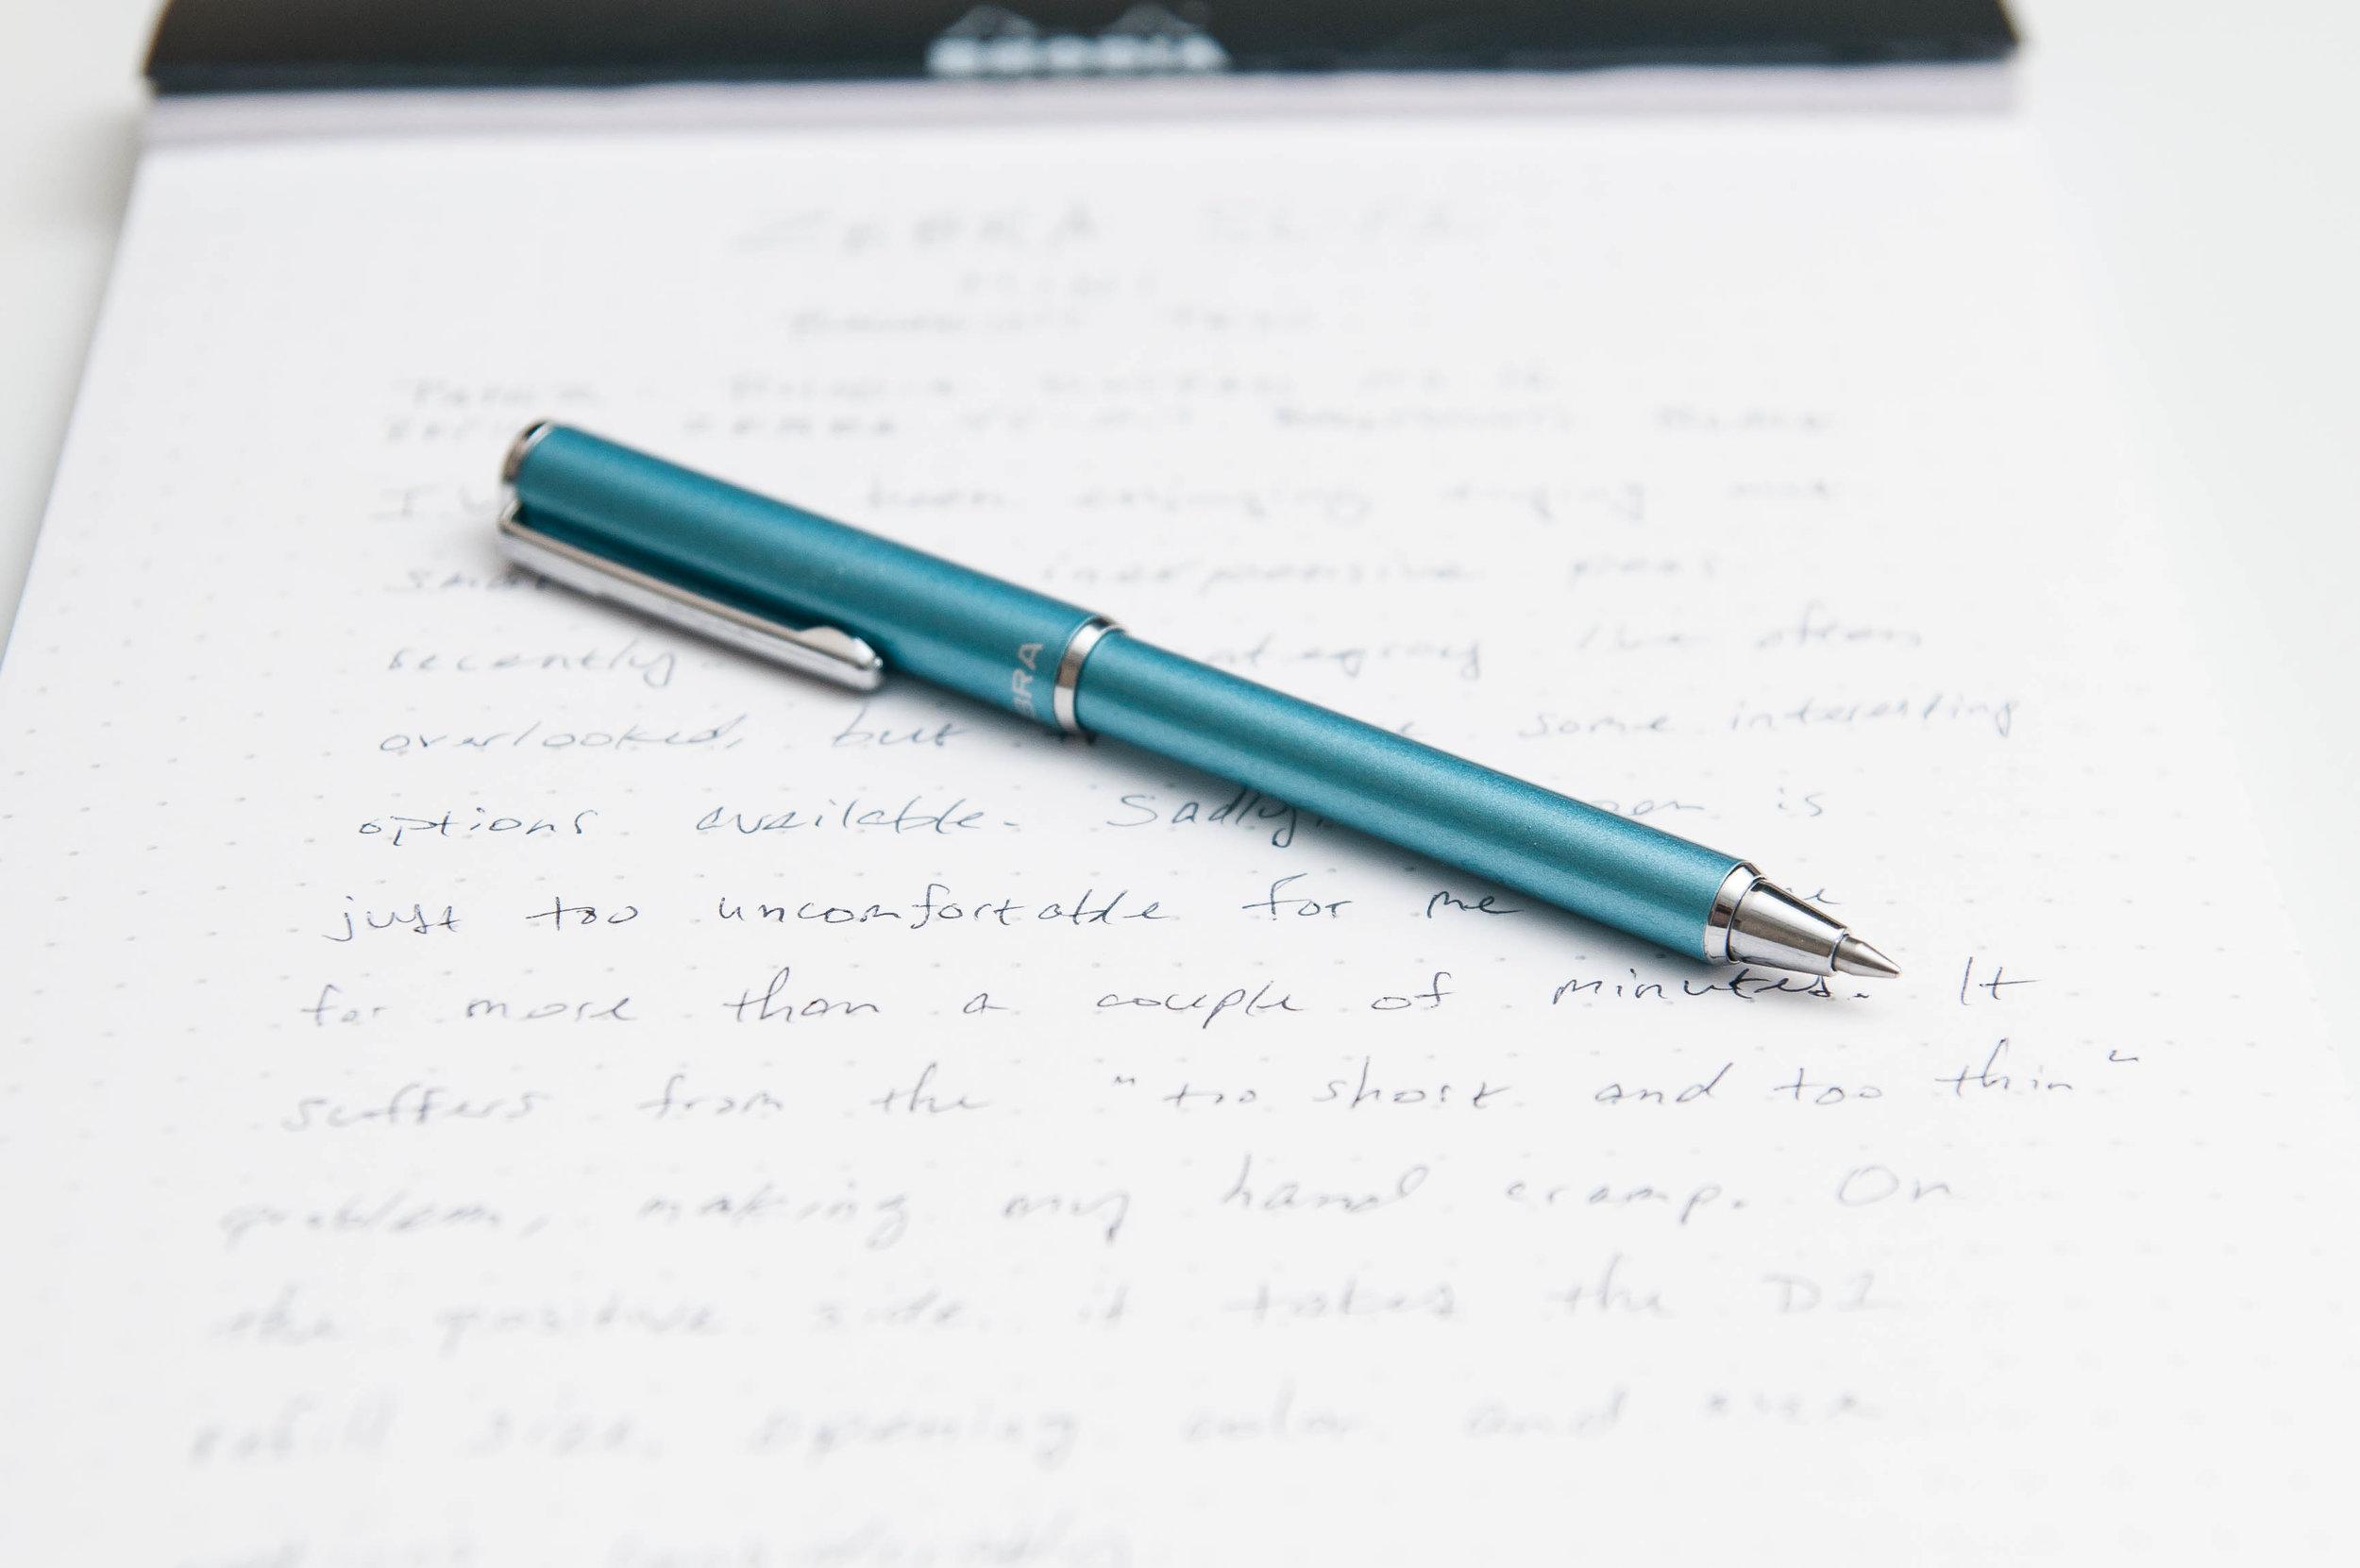 Zebra SL-F1 Mini Ballpoint Pen Expanded